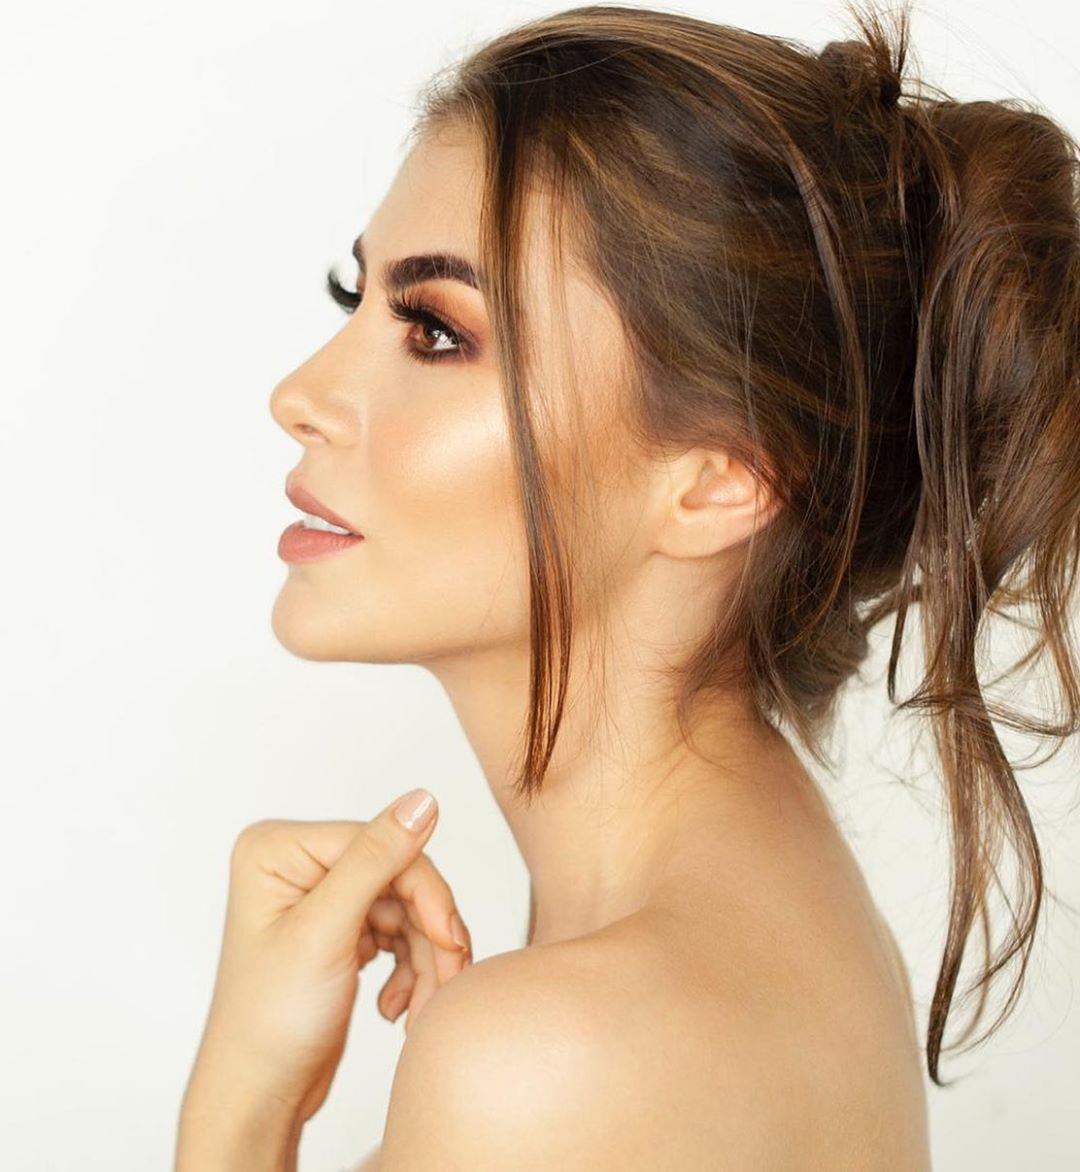 alejandra salazar, miss international colombia 2021. - Página 2 81929610